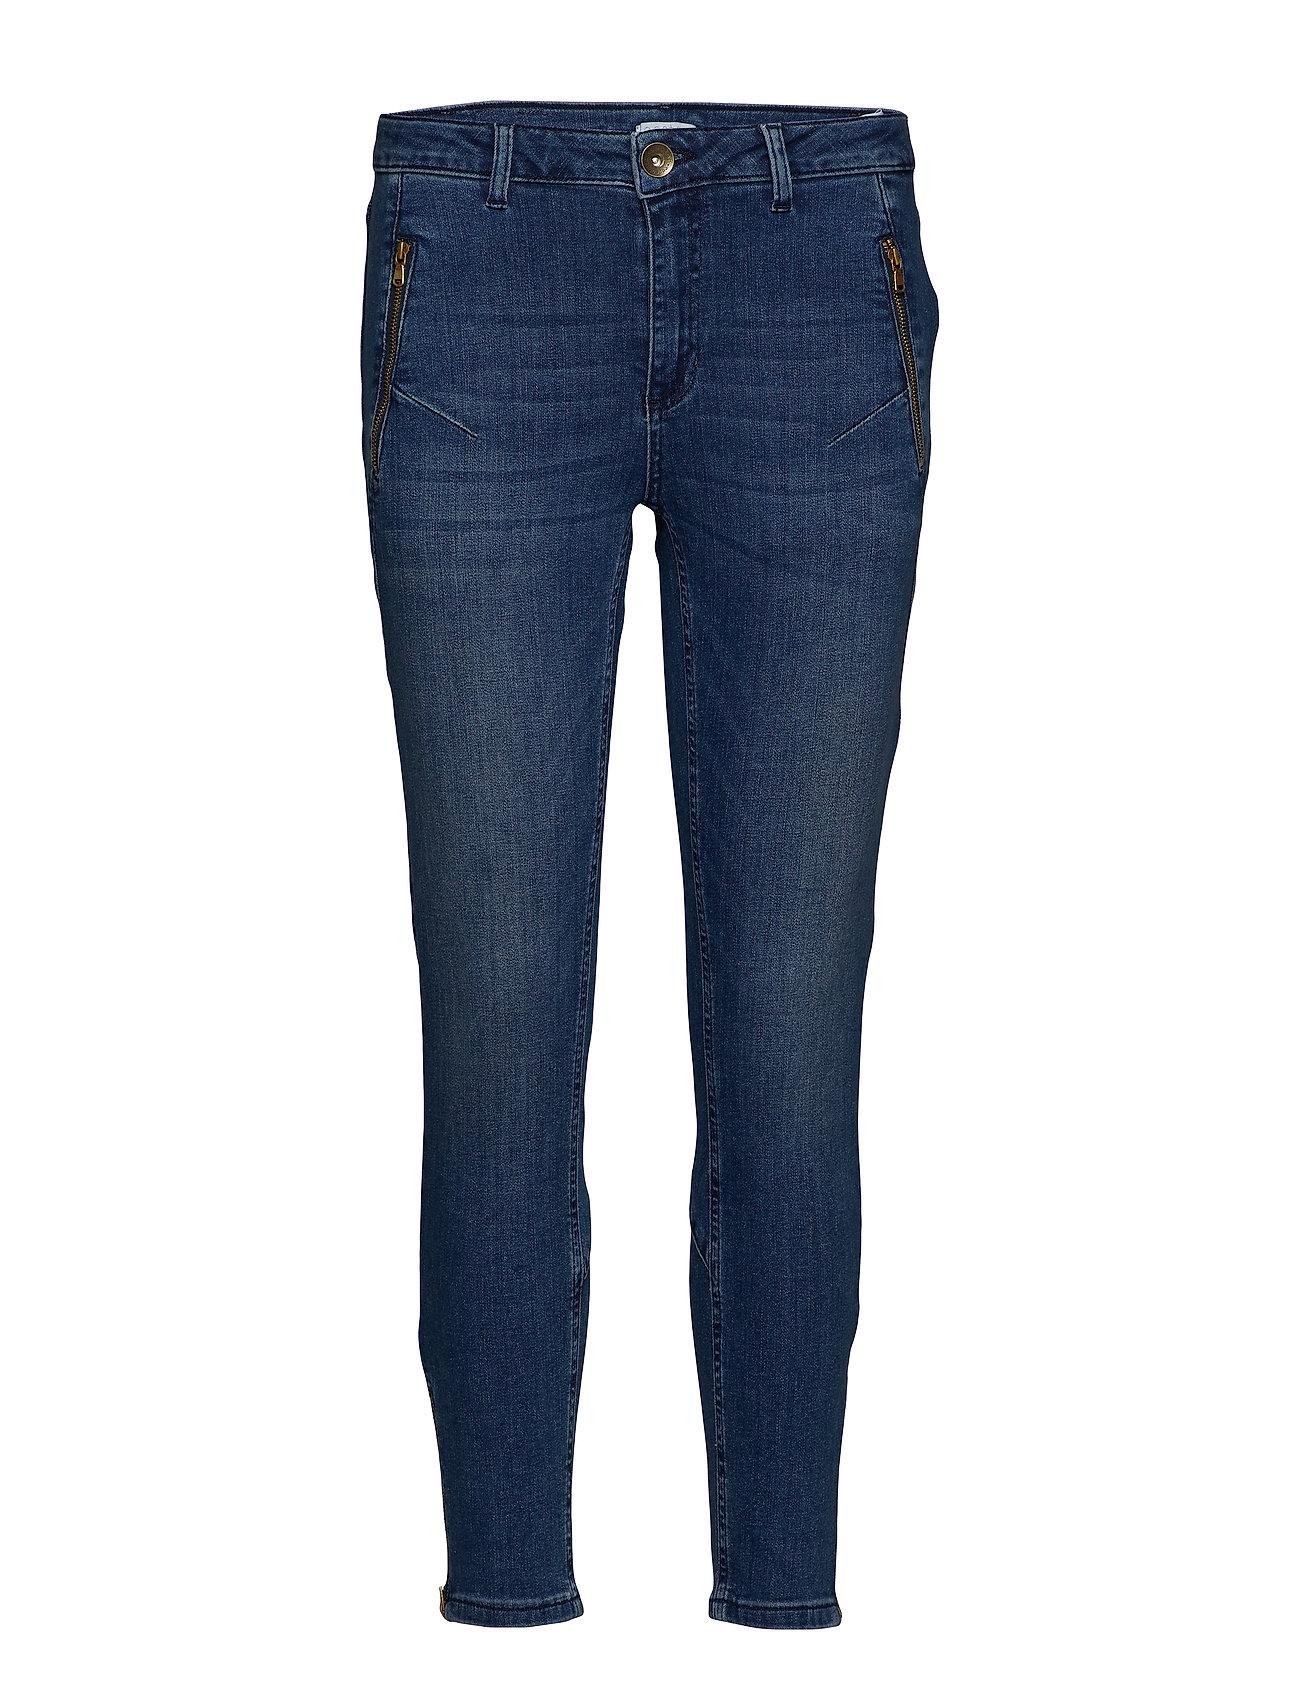 Coster Copenhagen Relaxed Jeans in 7/8 length - INDIGO BLUE